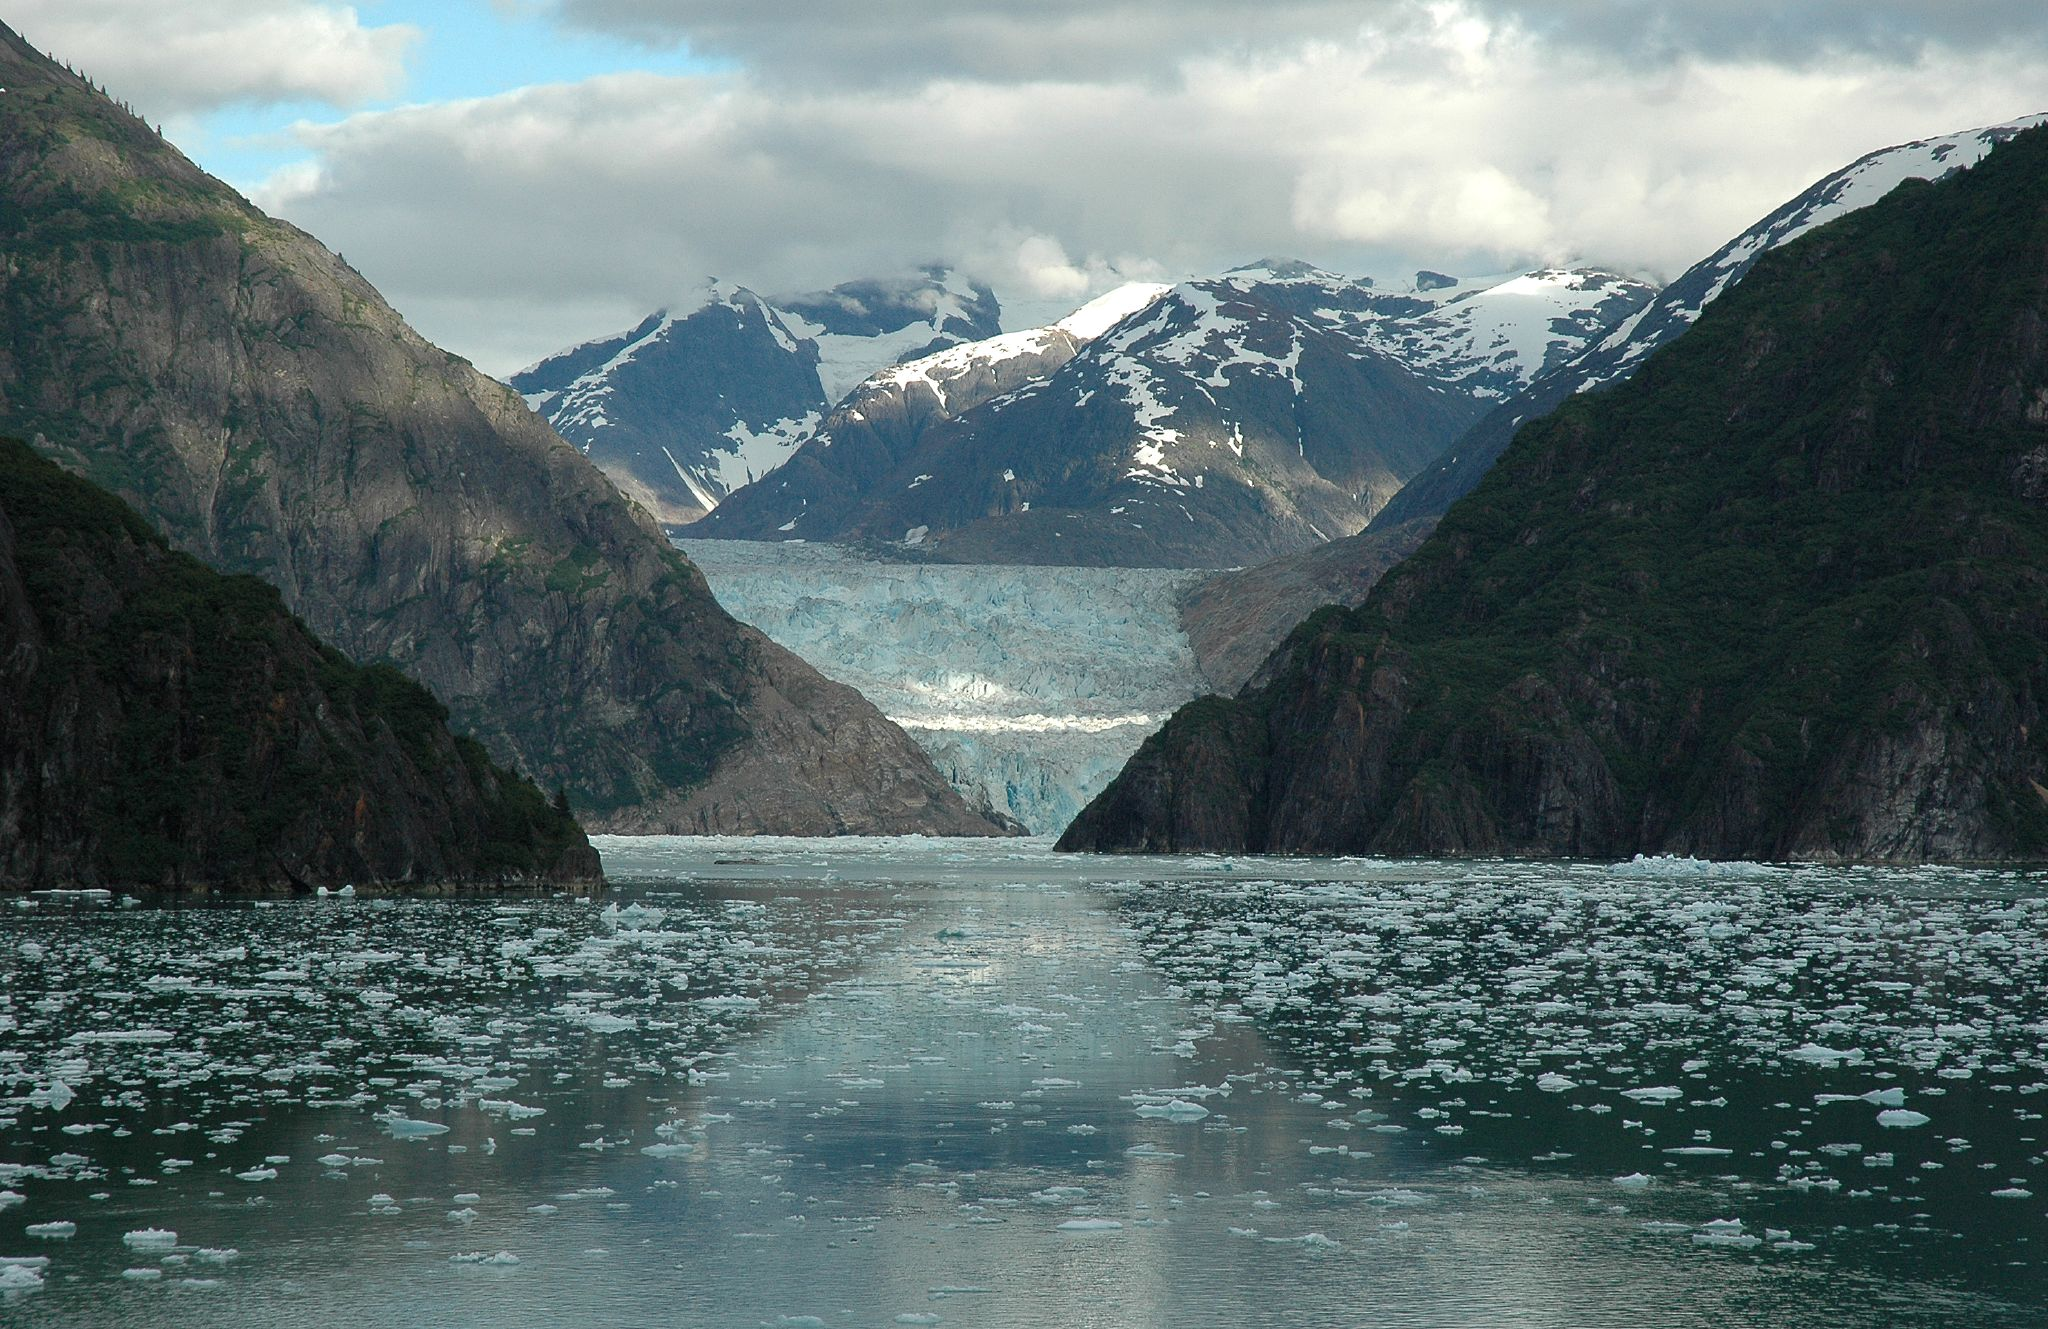 Fjord - Page 2 Tracy_Arm_fjord_Sawyer_Glacier